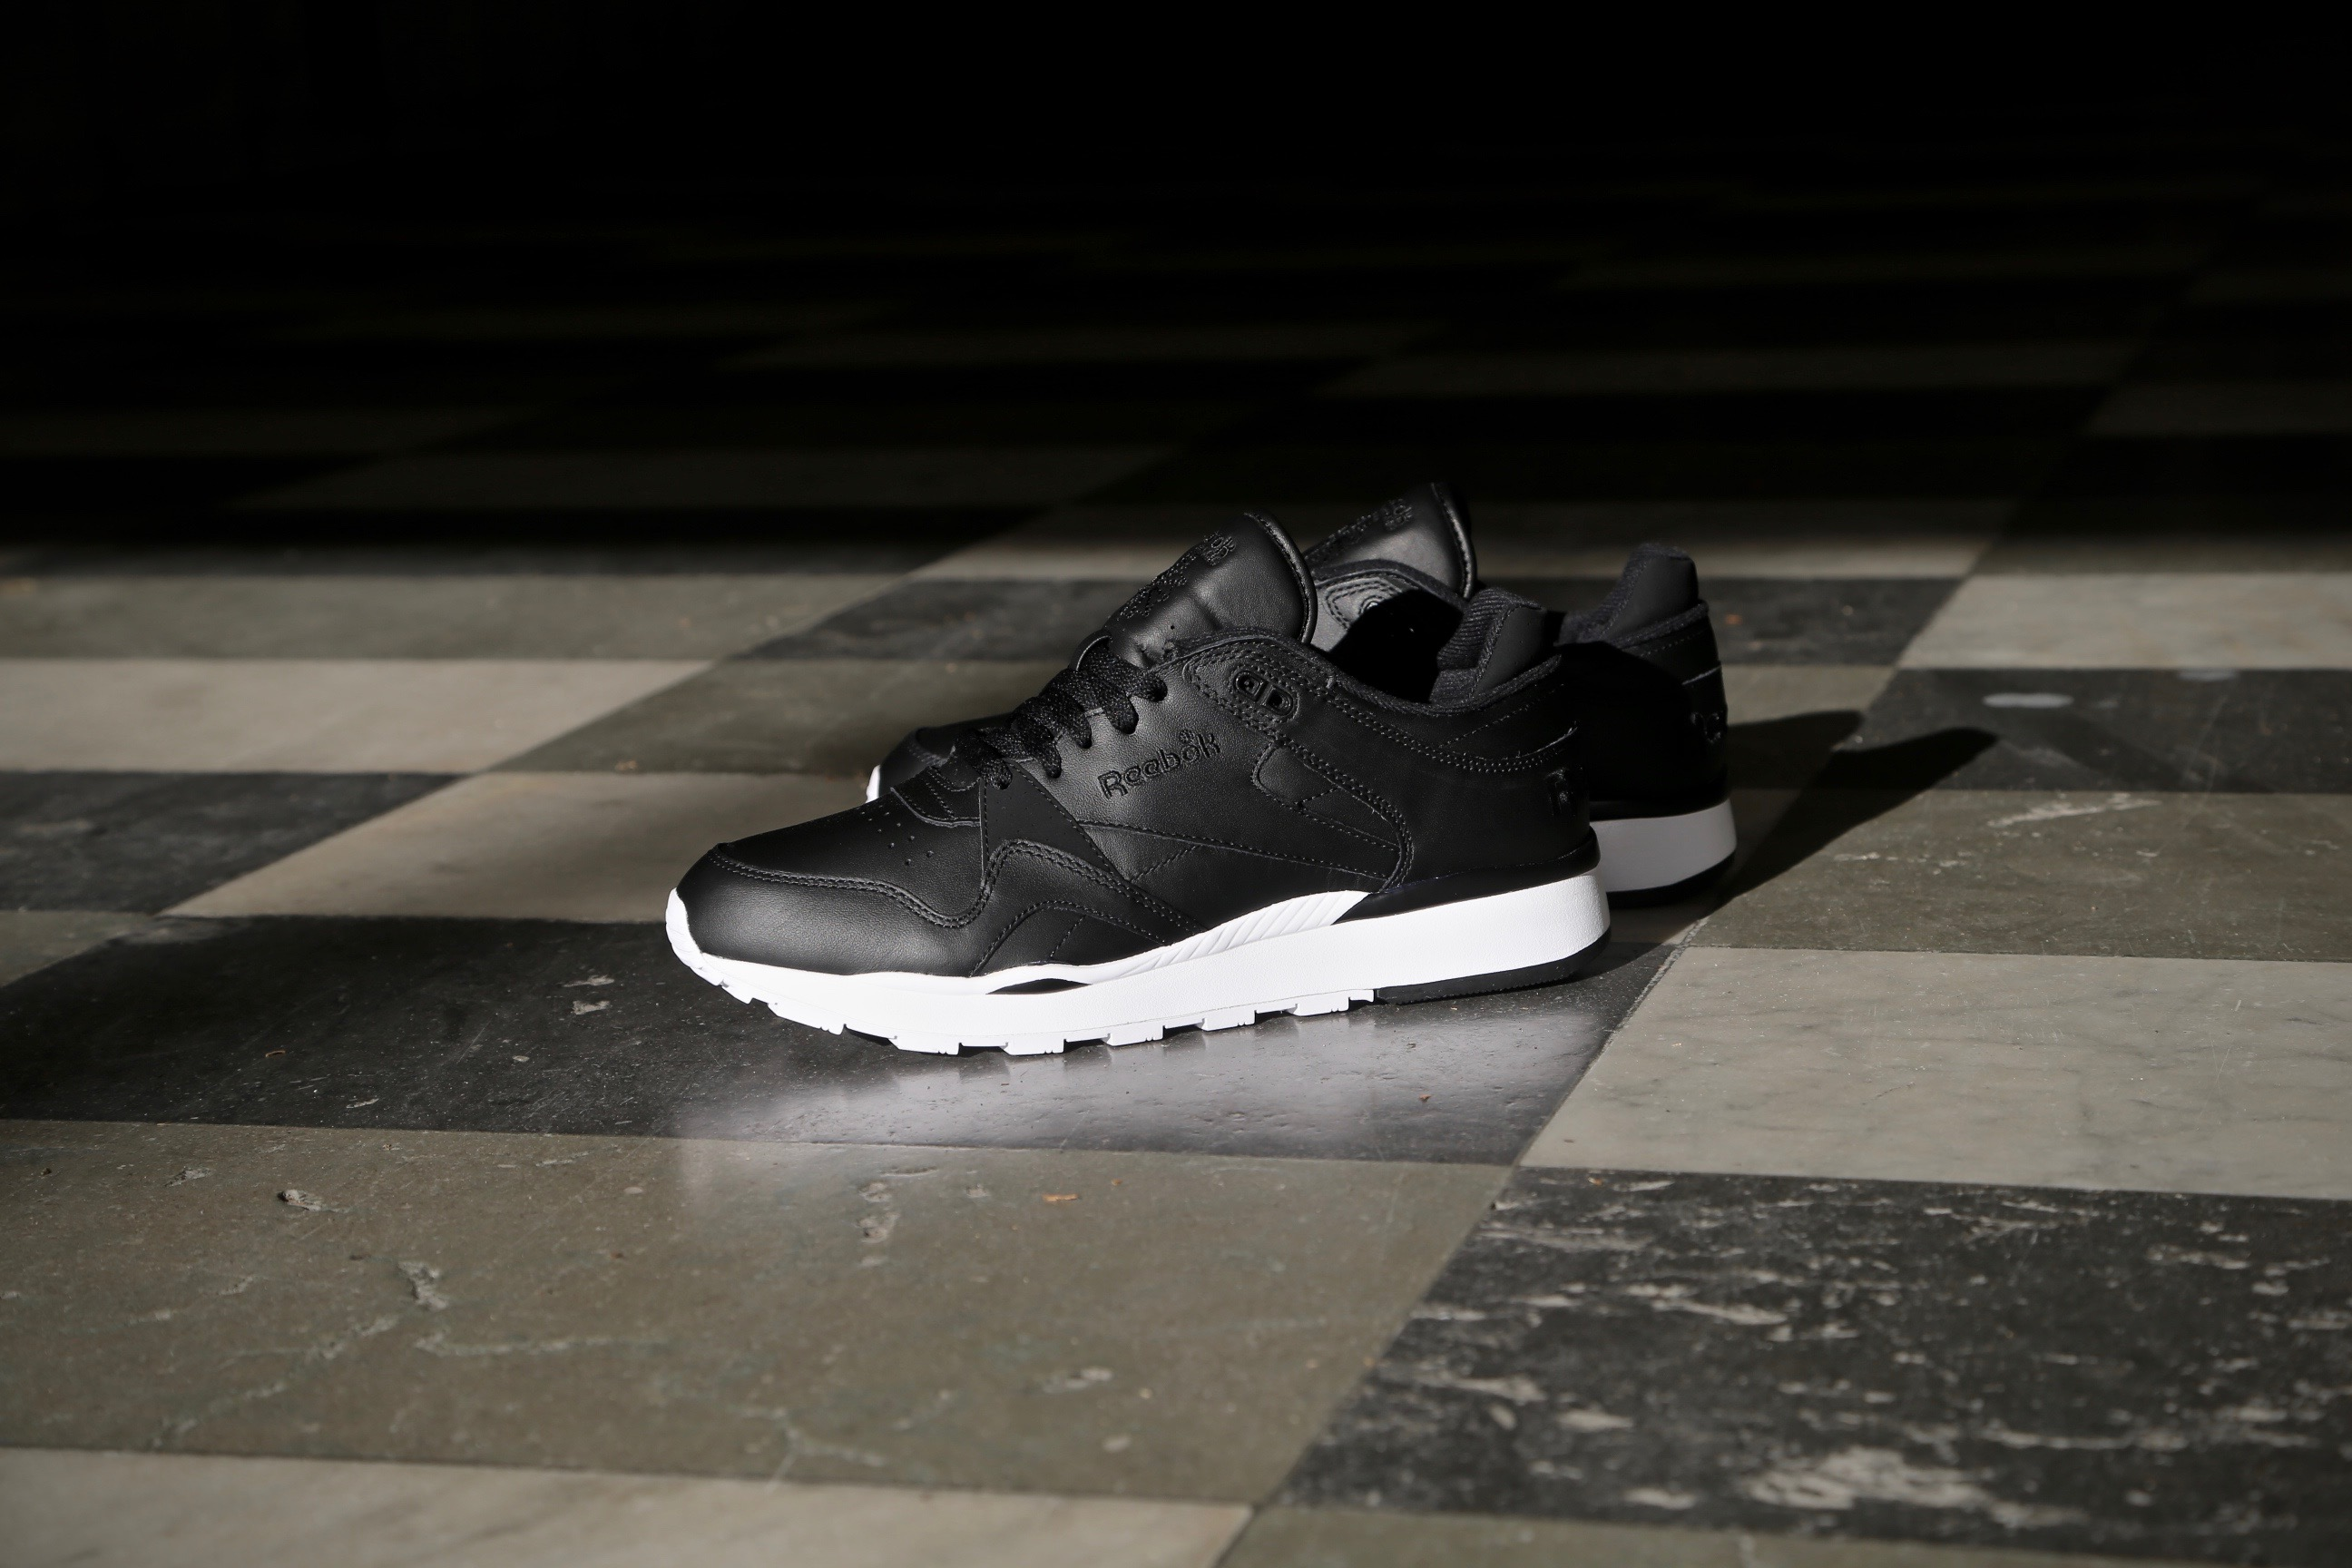 Reebok CL Leather II – Black White – STASP